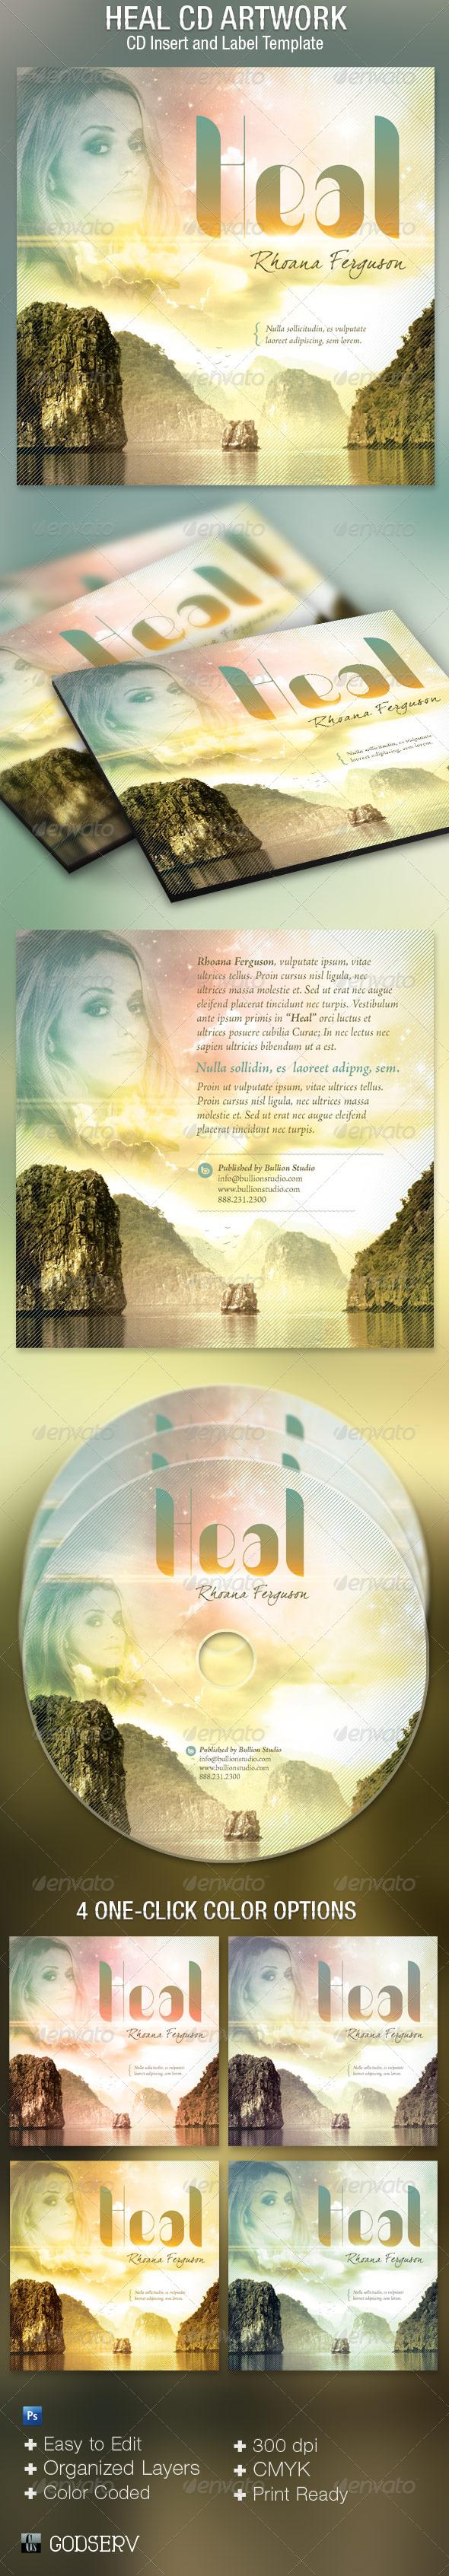 Heal CD Artwork Template - CD & DVD Artwork Print Templates